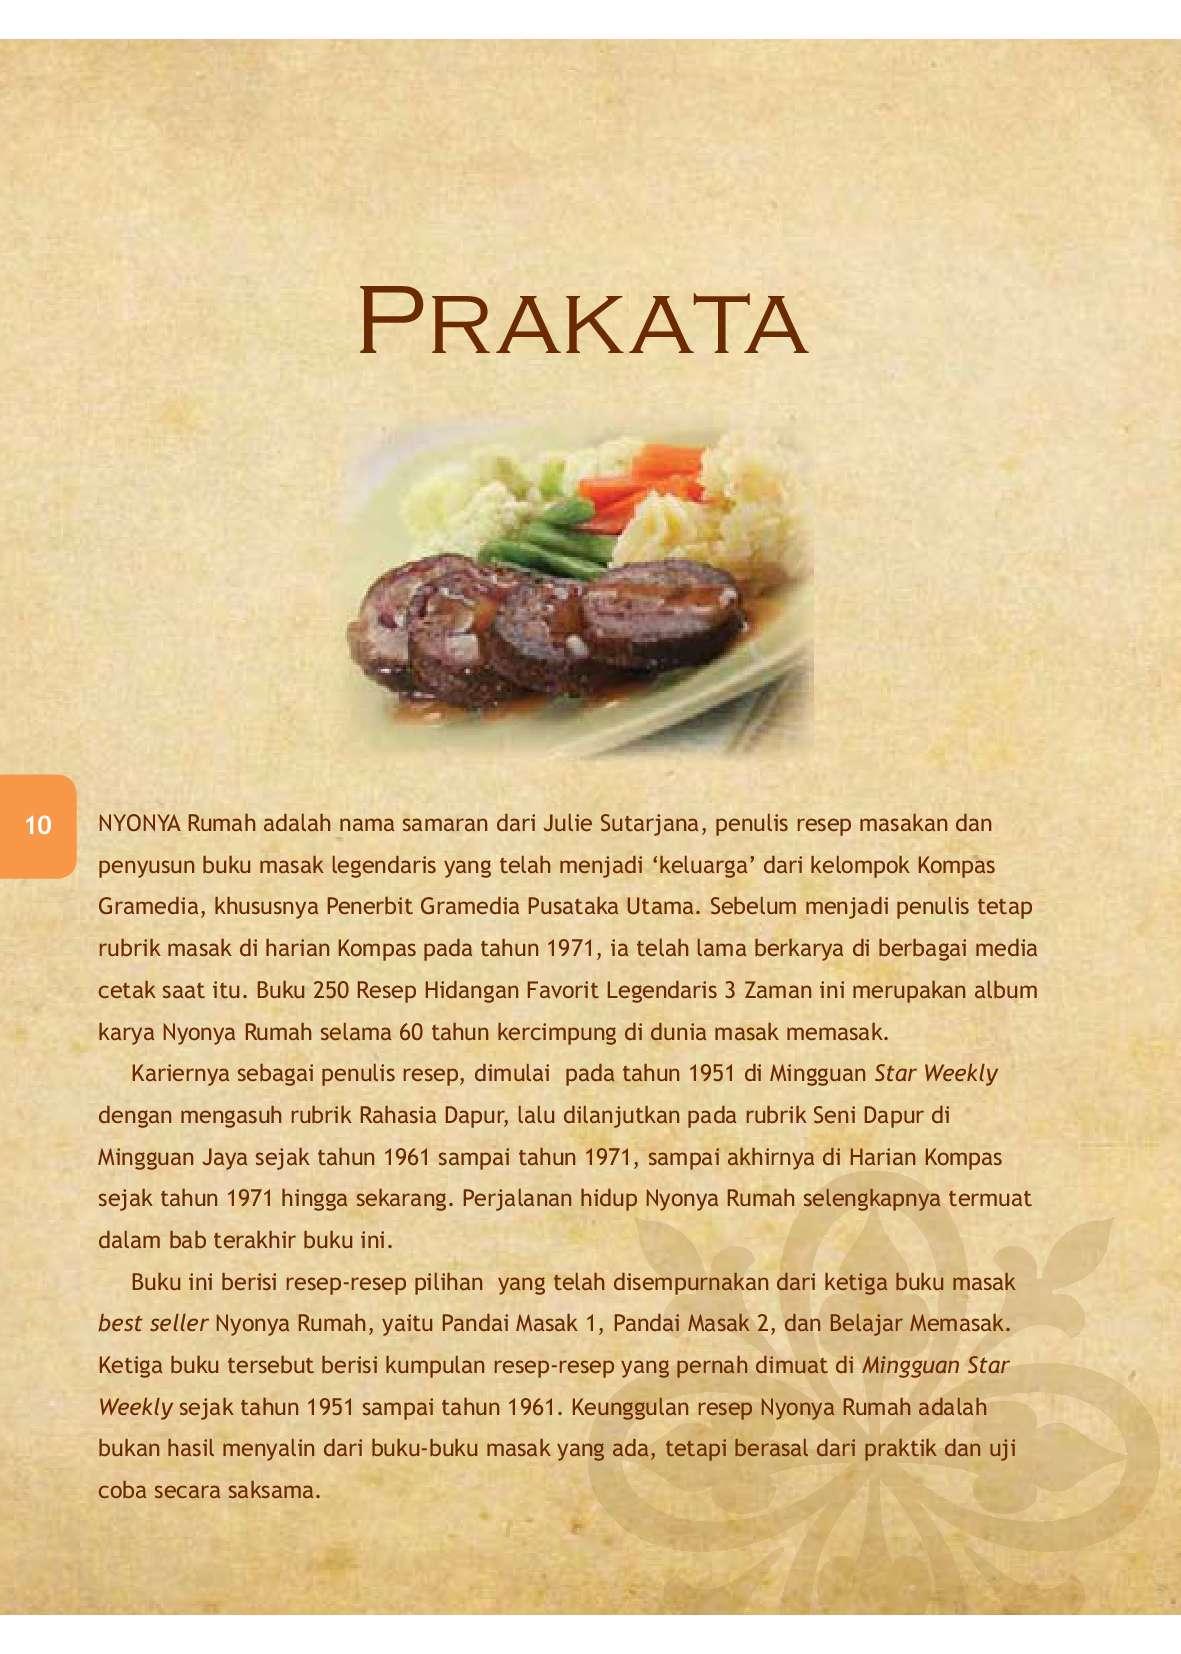 Jual Buku 250 Resep Hidangan Pilihan Nyonya Rumah 60 Tahun Berkarya Oleh Nyonya Rumah Gramedia Digital Indonesia